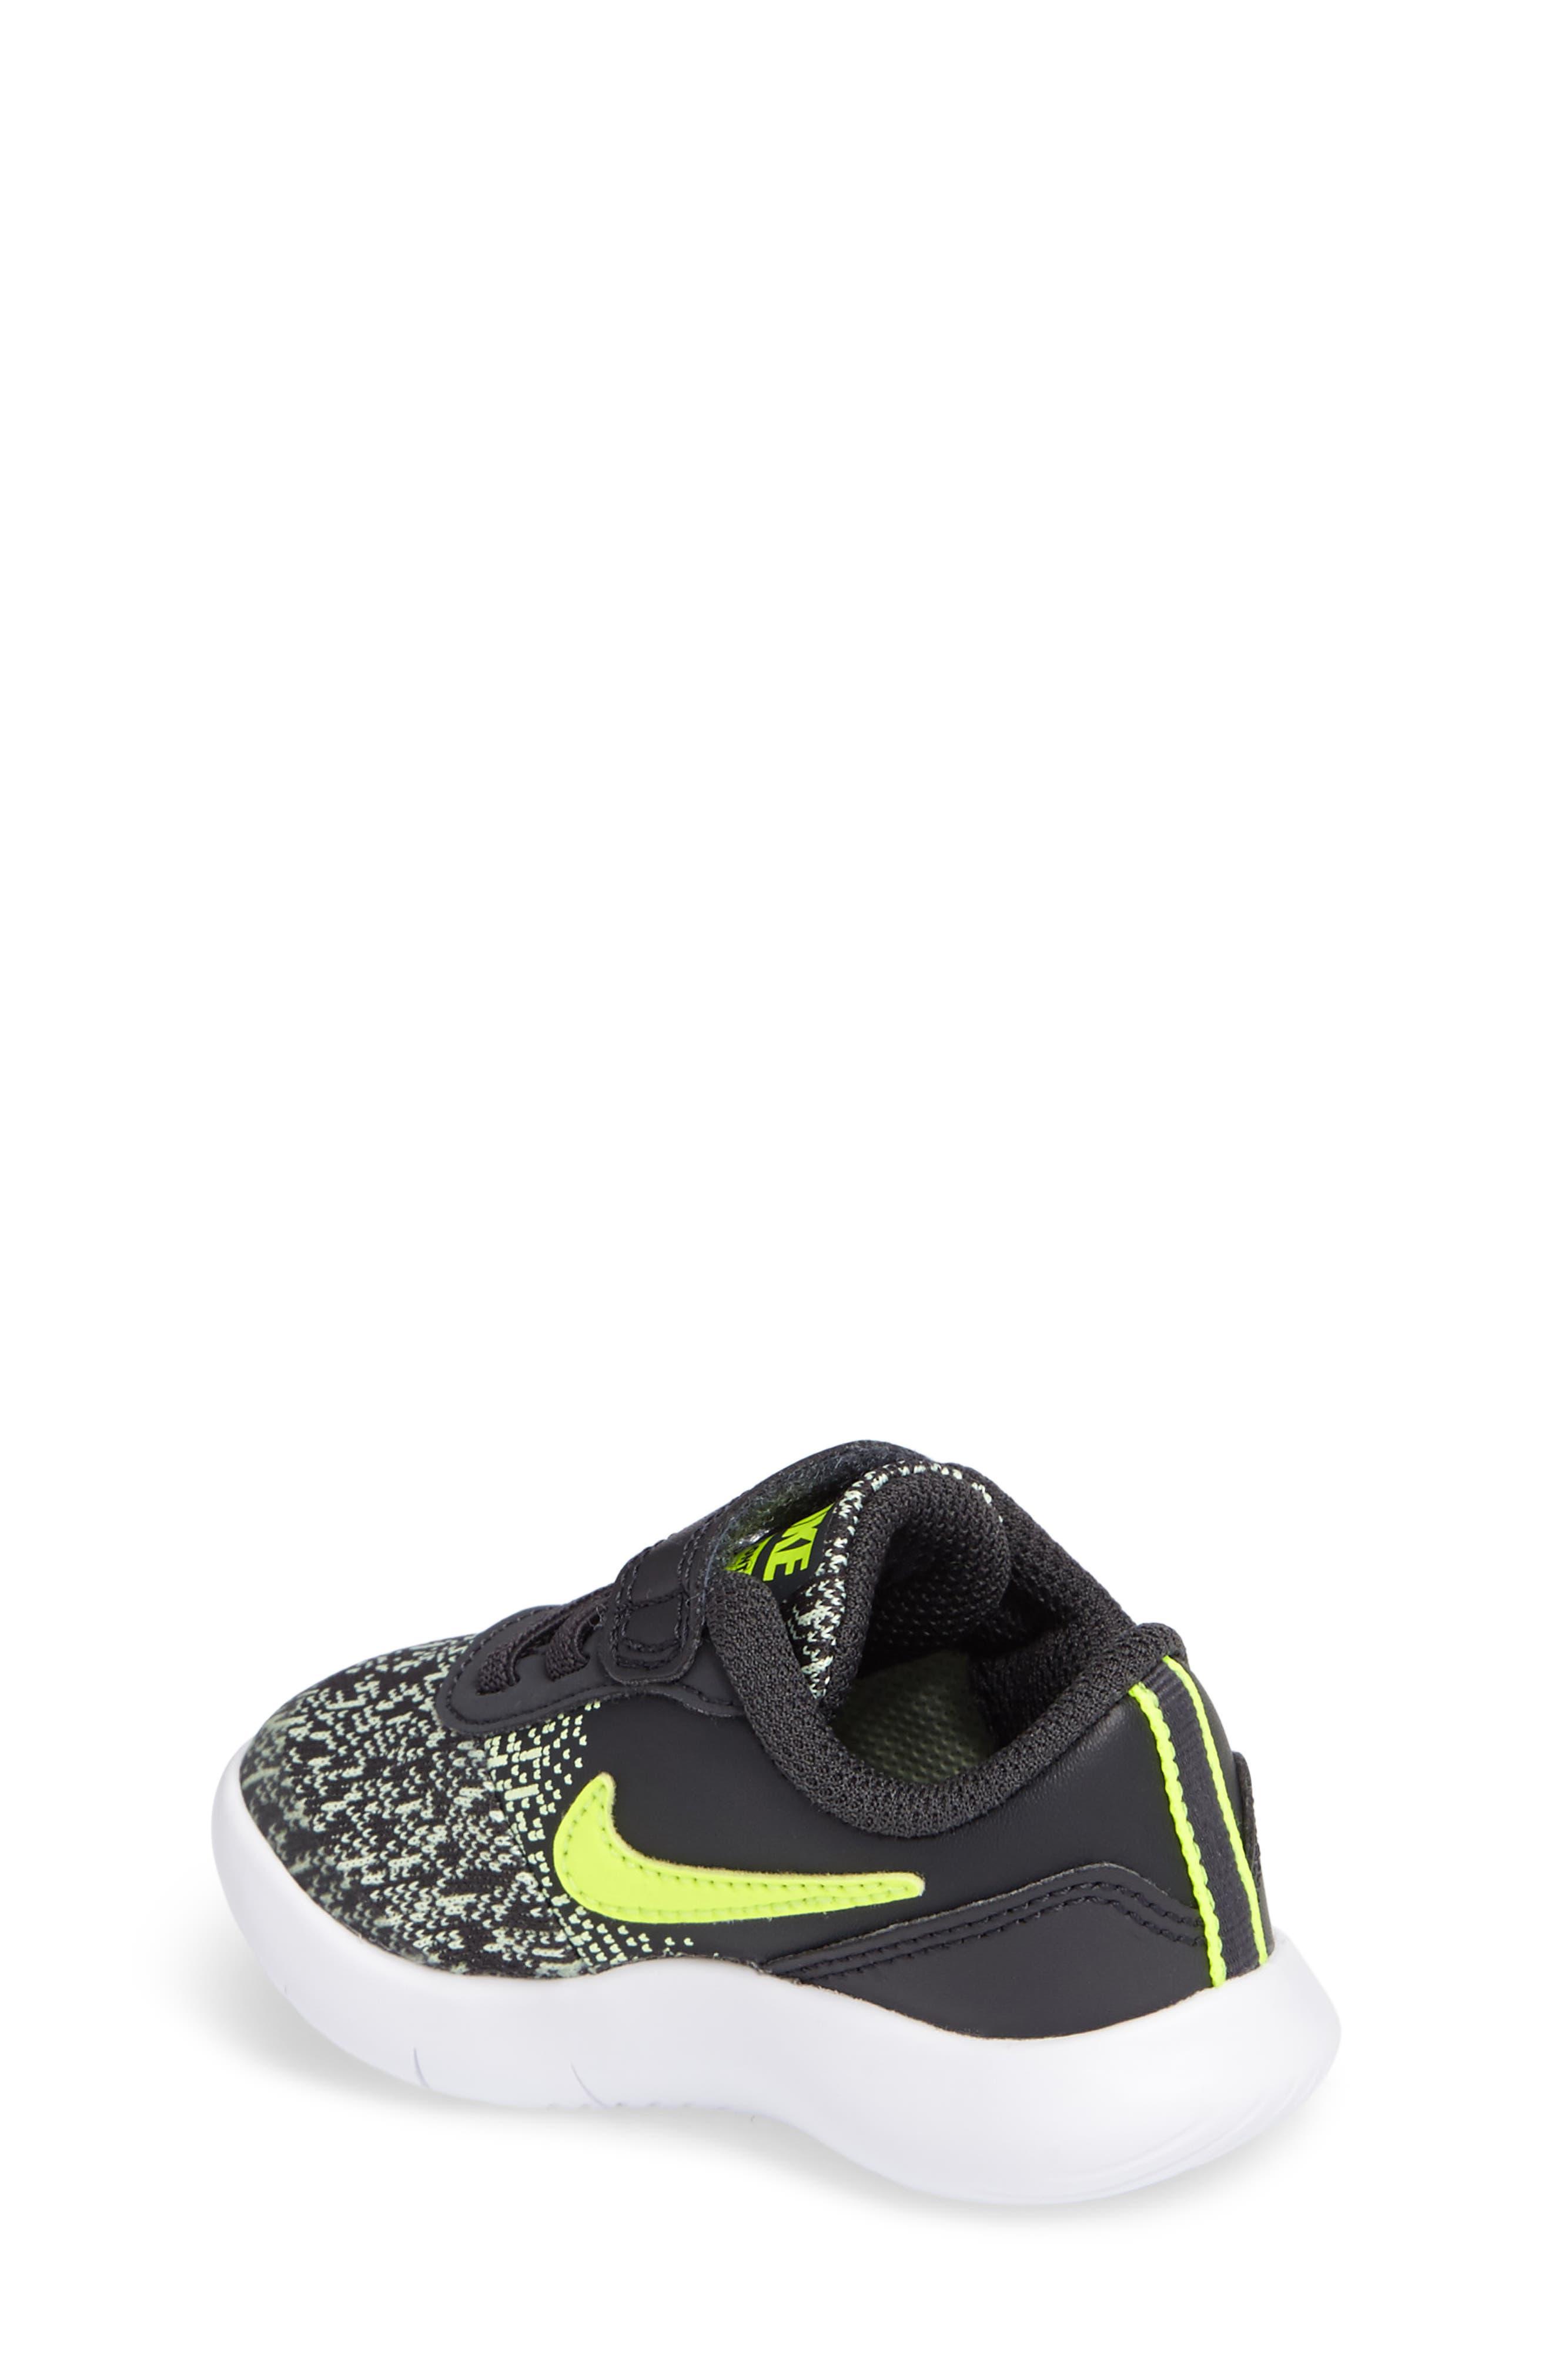 Flex Contact Sneaker,                             Alternate thumbnail 2, color,                             021